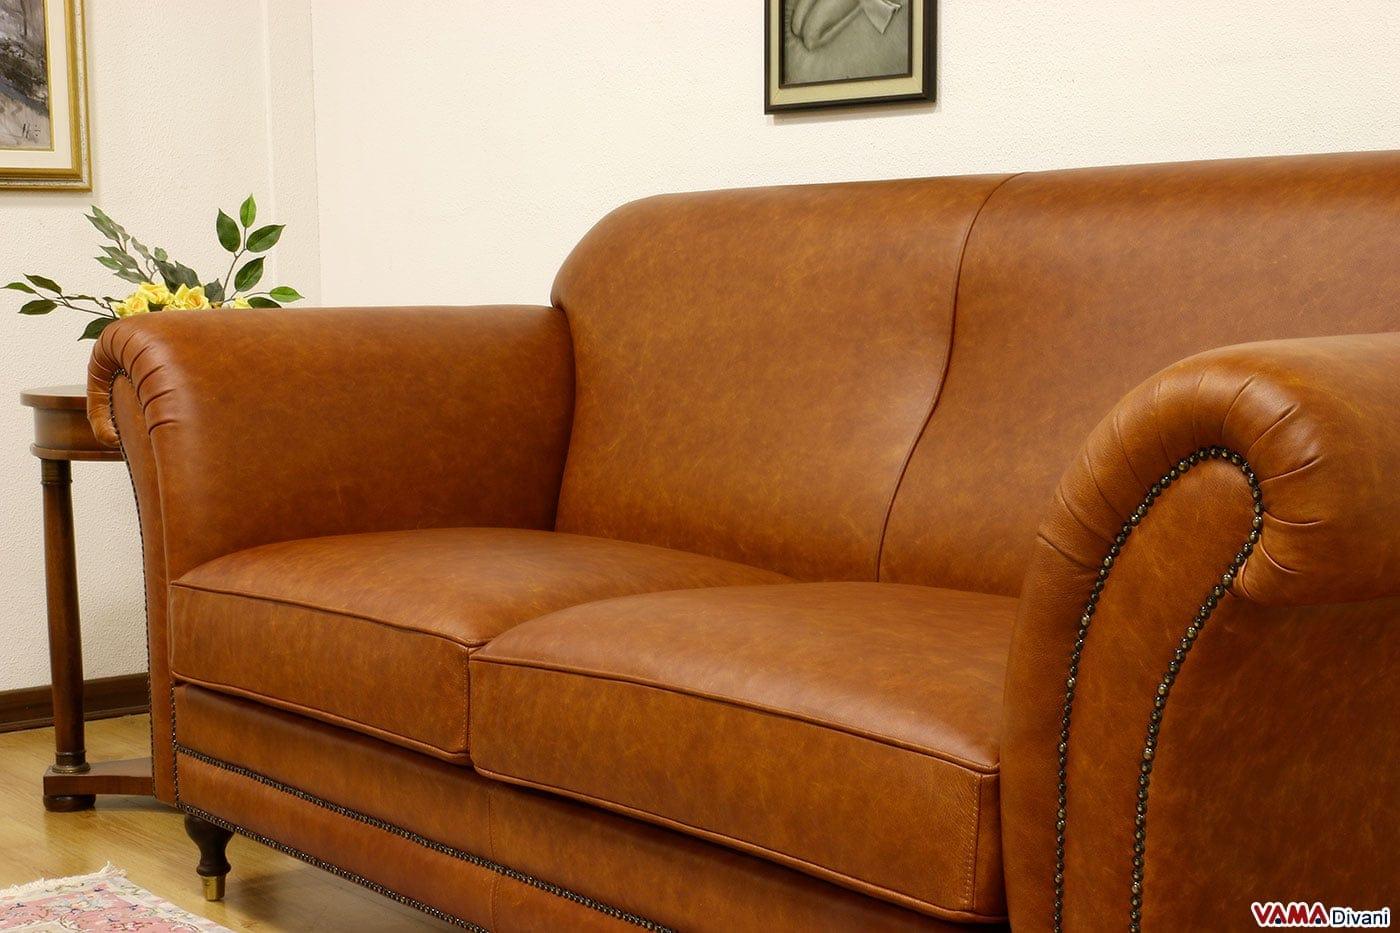 Divano classico stile inglese in pelle marrone chiaro vintage for Divano in inglese